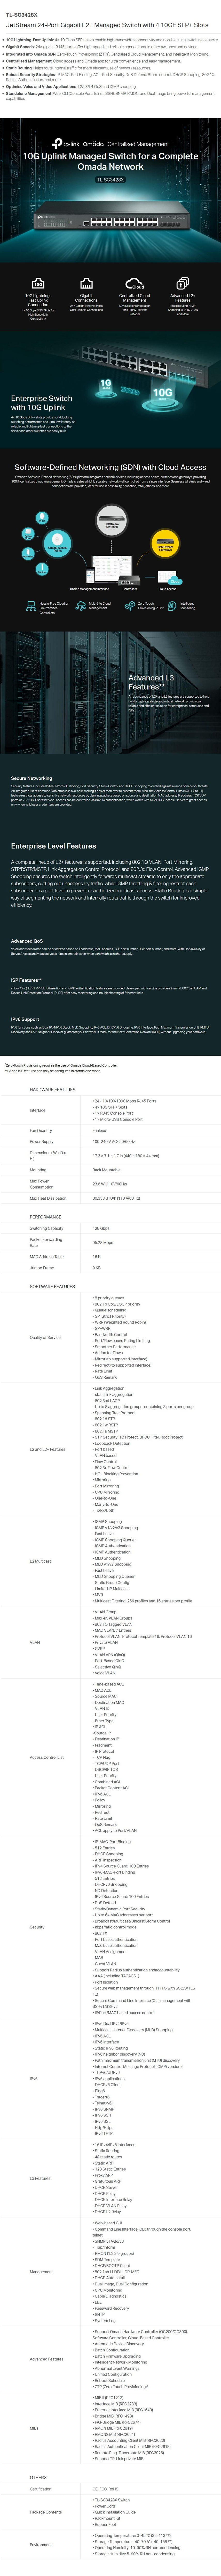 tplink-tlsg3428x-jetstream-24port-gigabit-l2-managed-switch-w-4-sfp-slots-ac41672-3.jpg